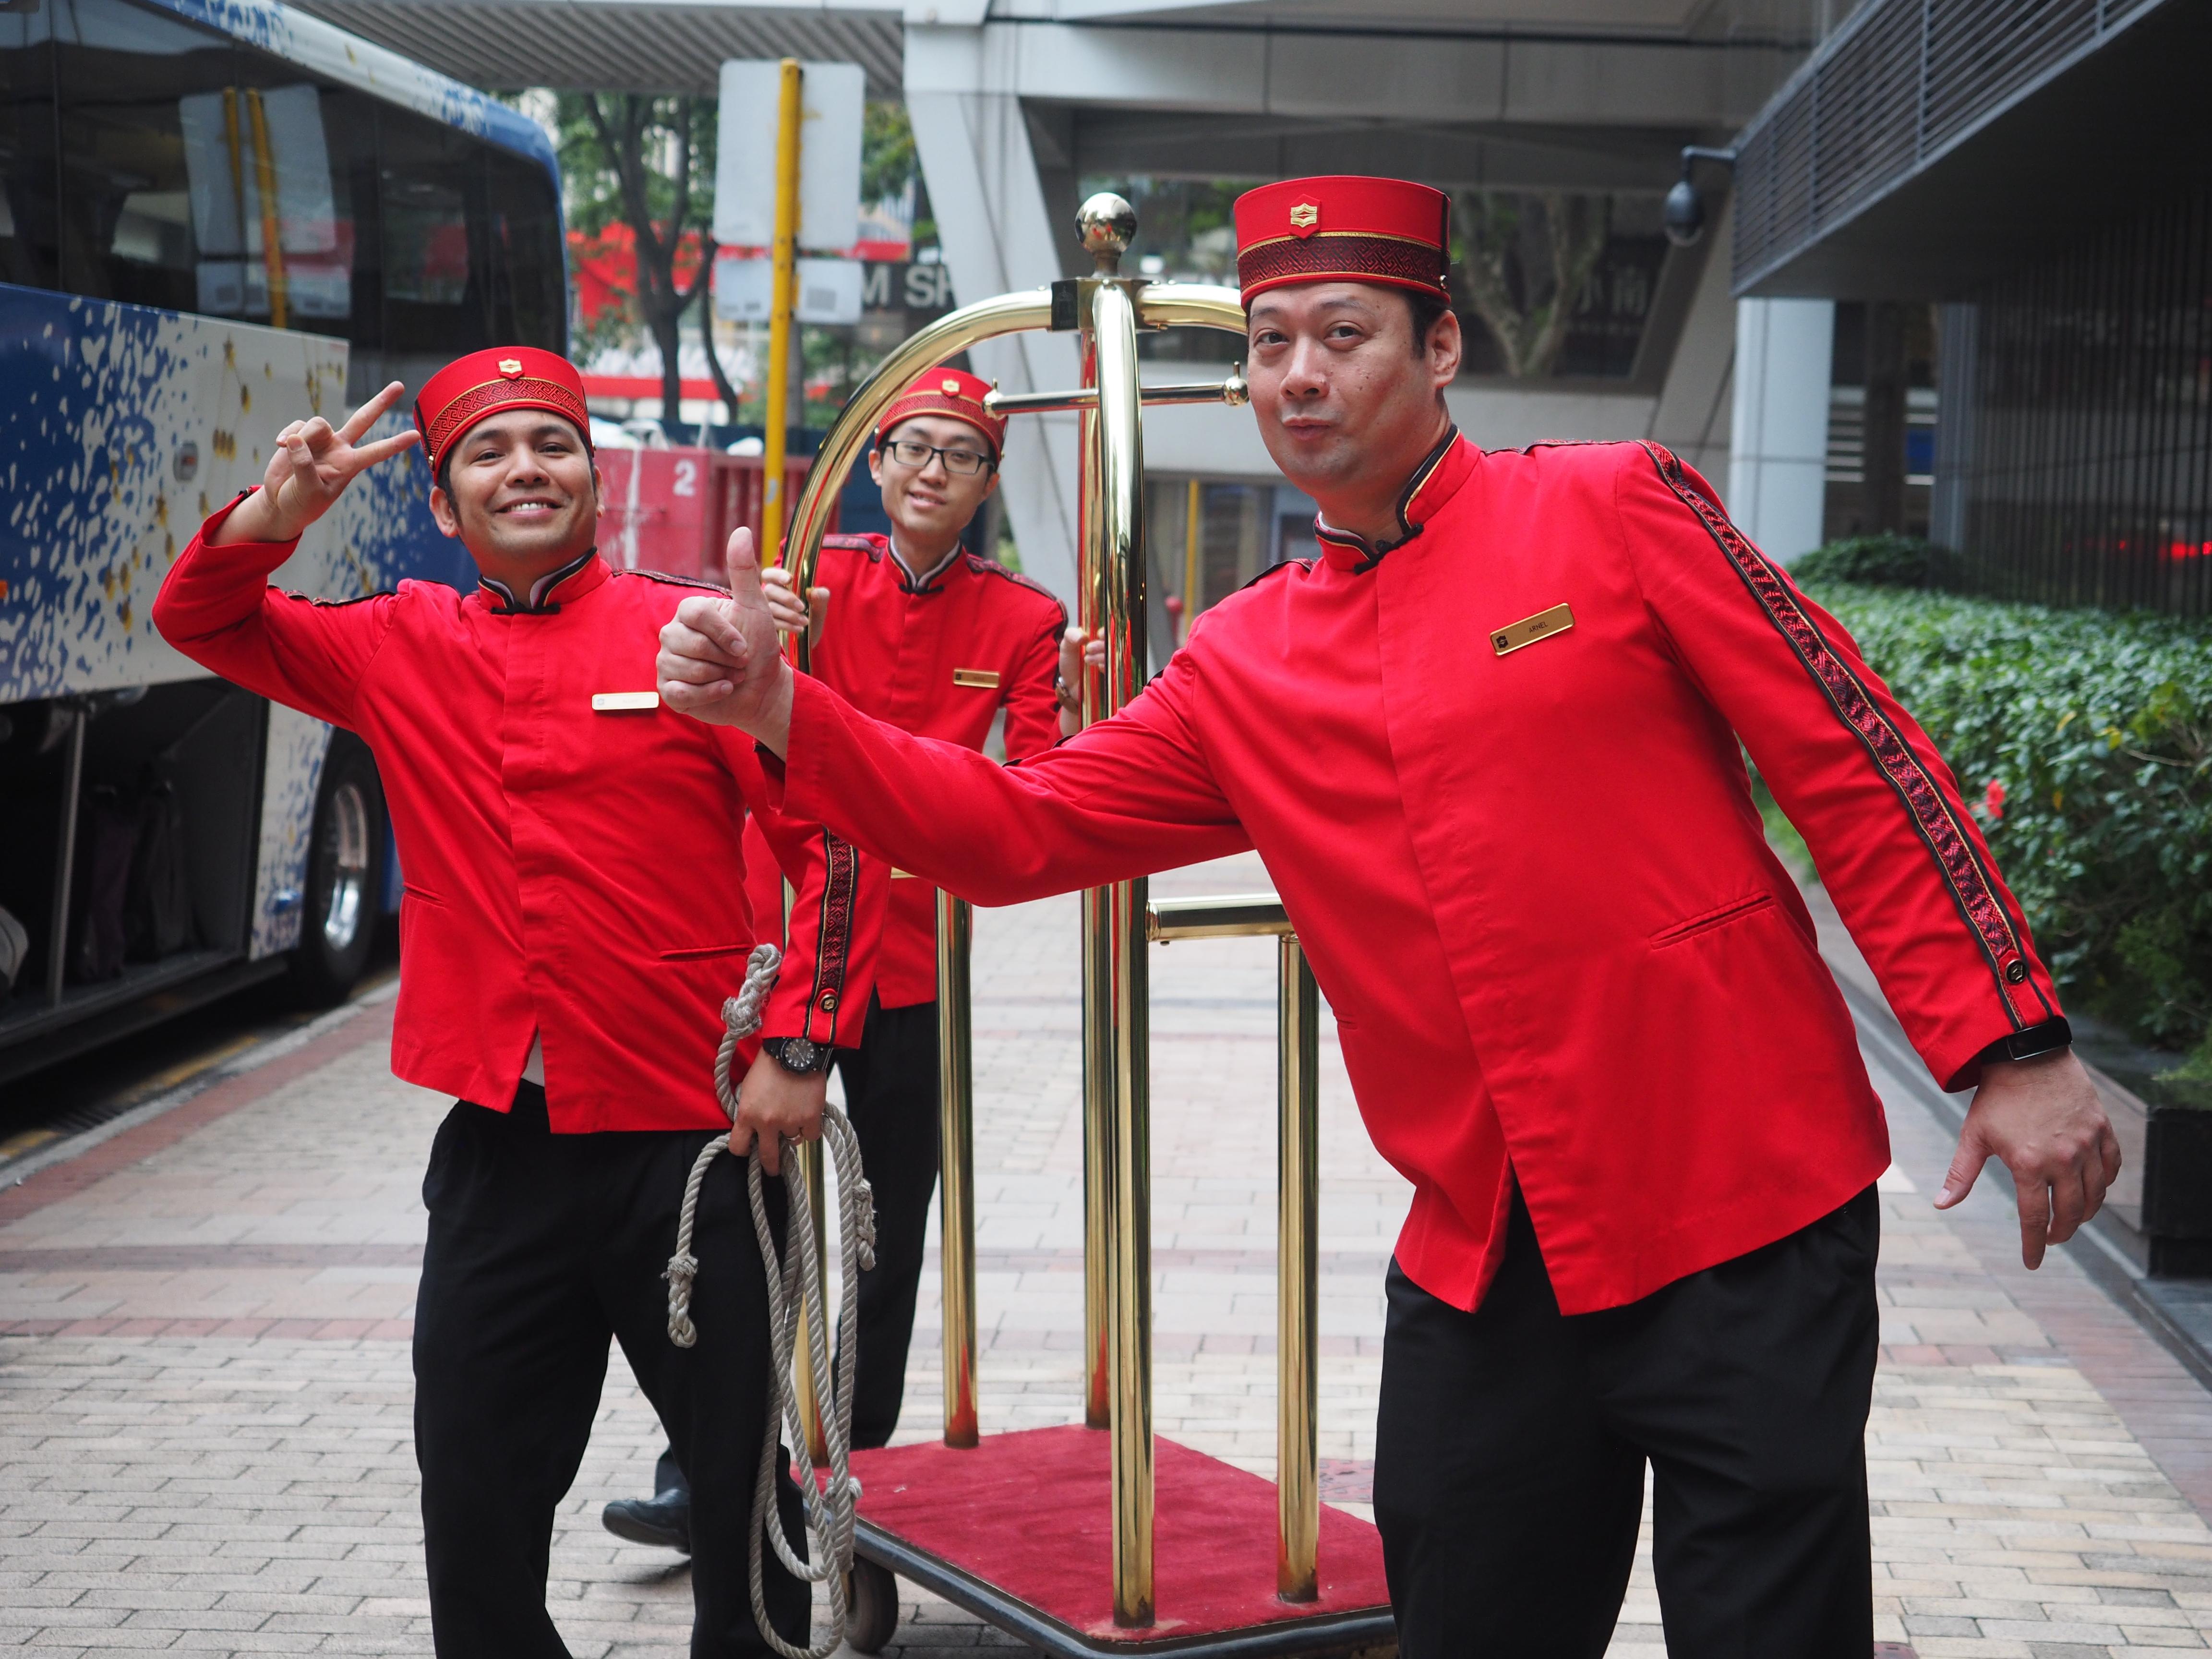 Accueil au Shangri-La Hong-Kong - Grand Voyage 2017